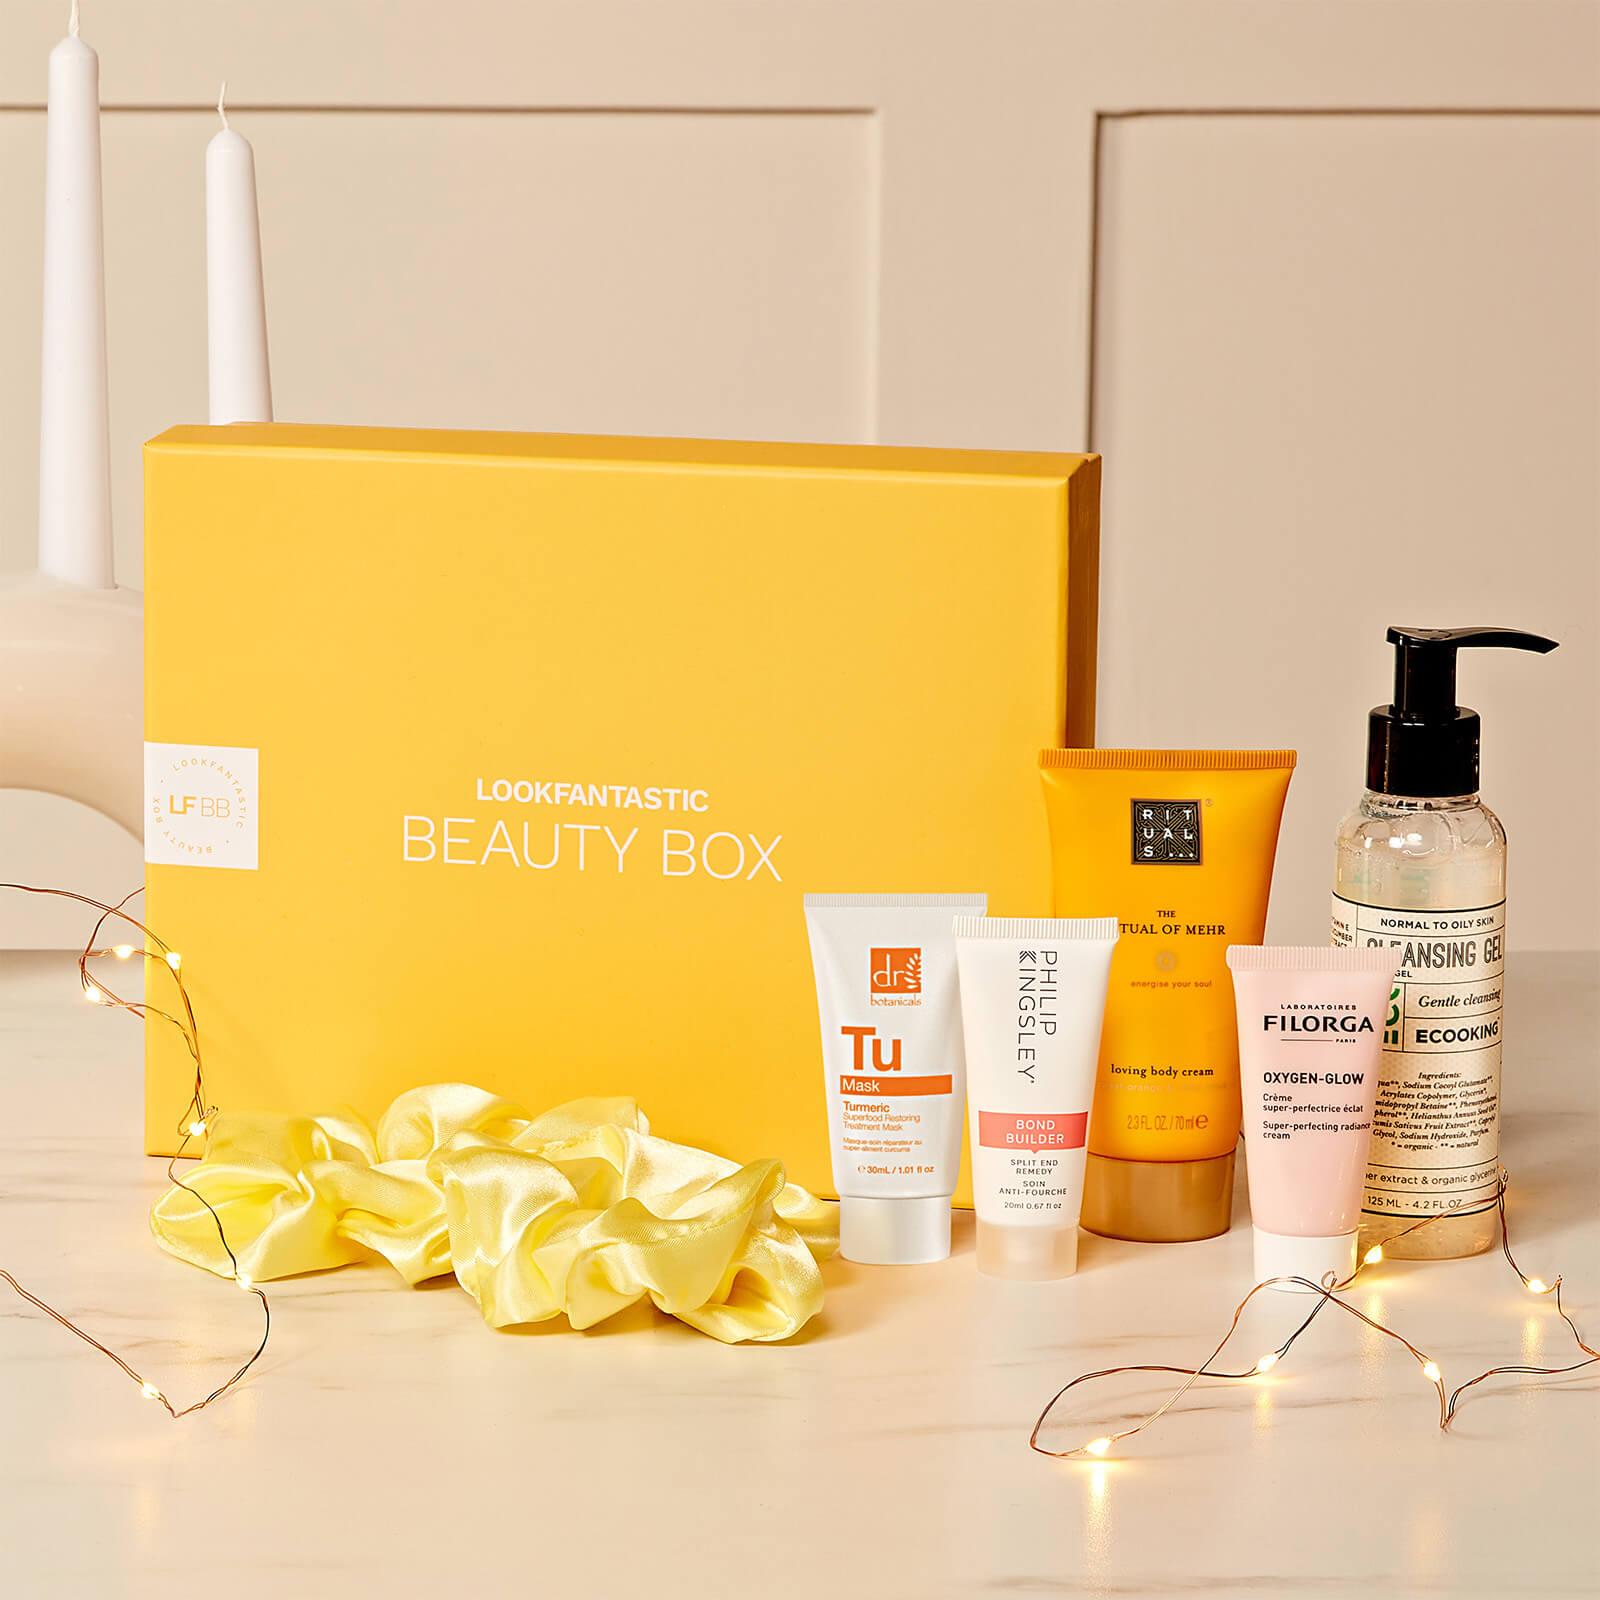 Abbonamento Beauty Box LOOKFANTASTIC 1 Month